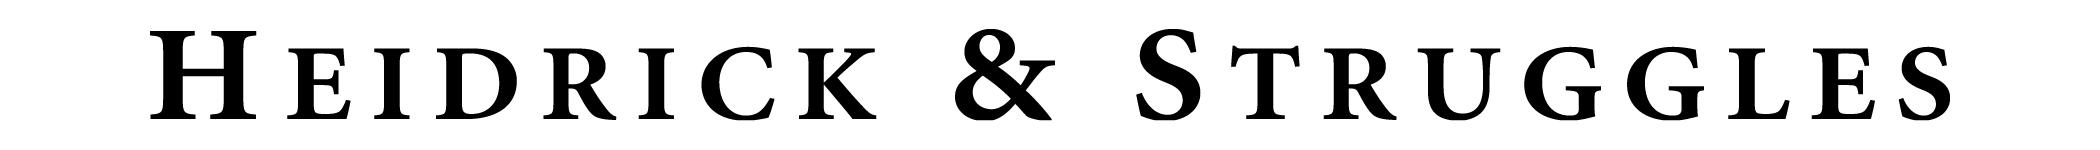 heidrick & struggles international, inc essay View notes - heidrick & struggles international case analysis from business gb520 at kaplan university heidrick & struggles international, inc case analysis thomas n bailey 2/8/2011 kaplan.